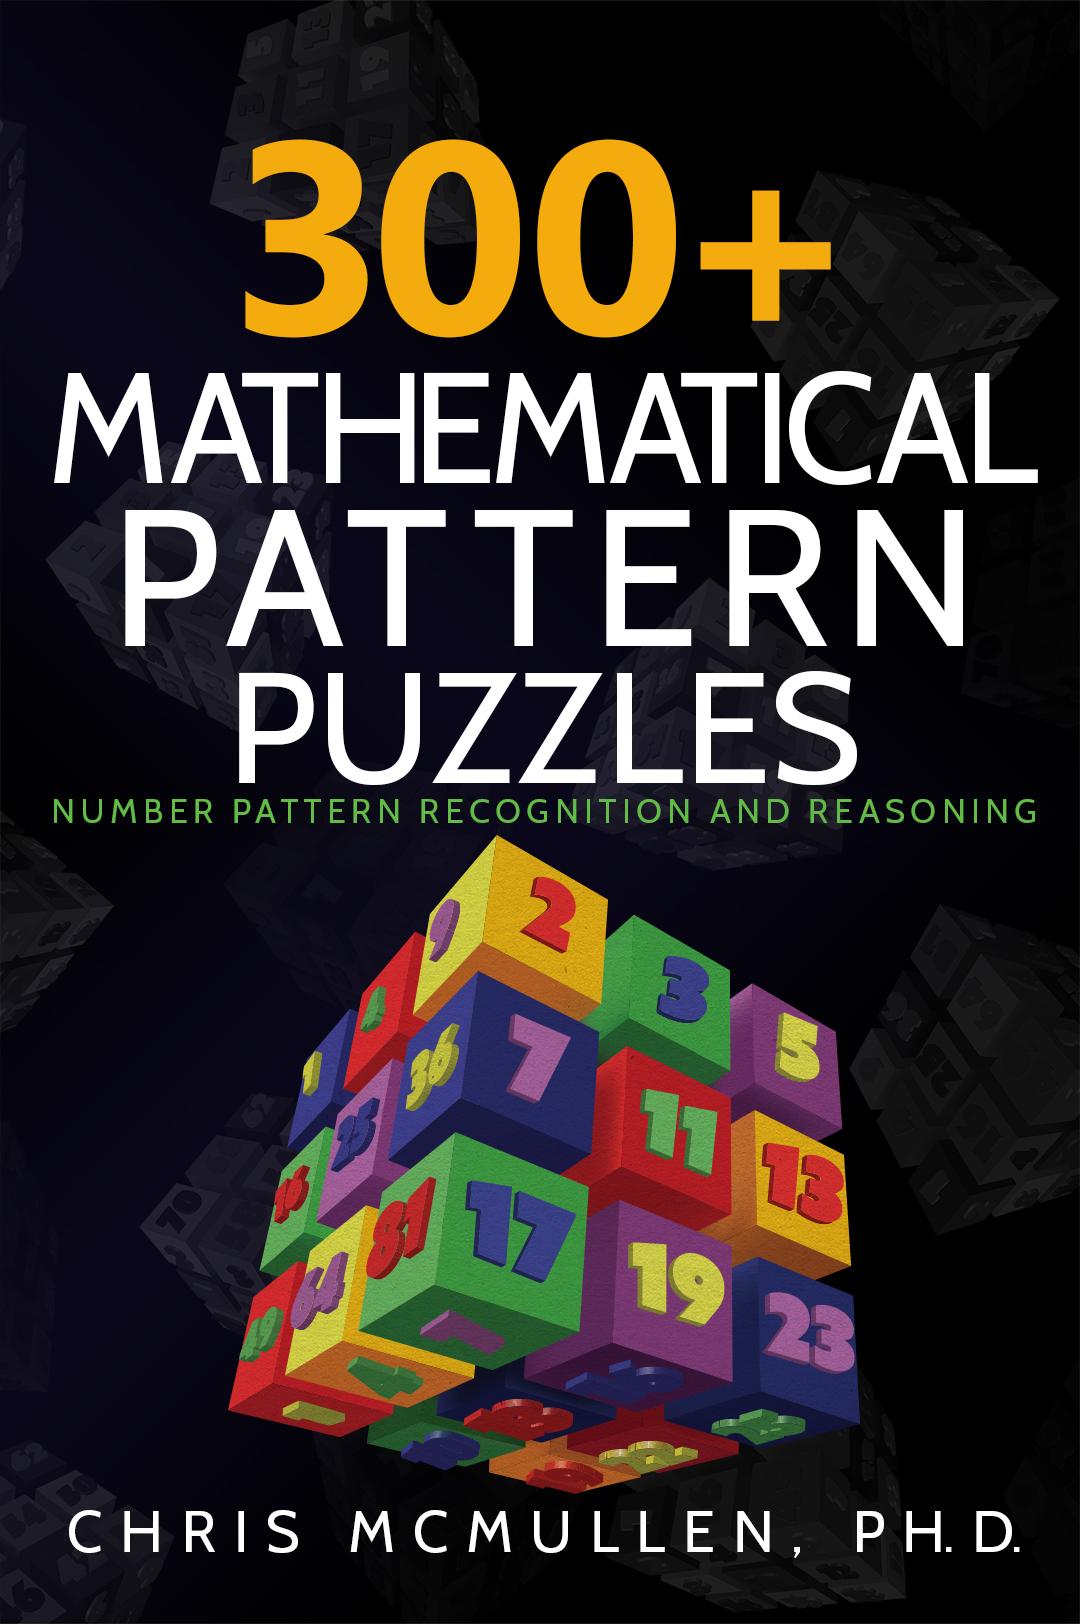 300-Mathematical-Pattern-Puzzles